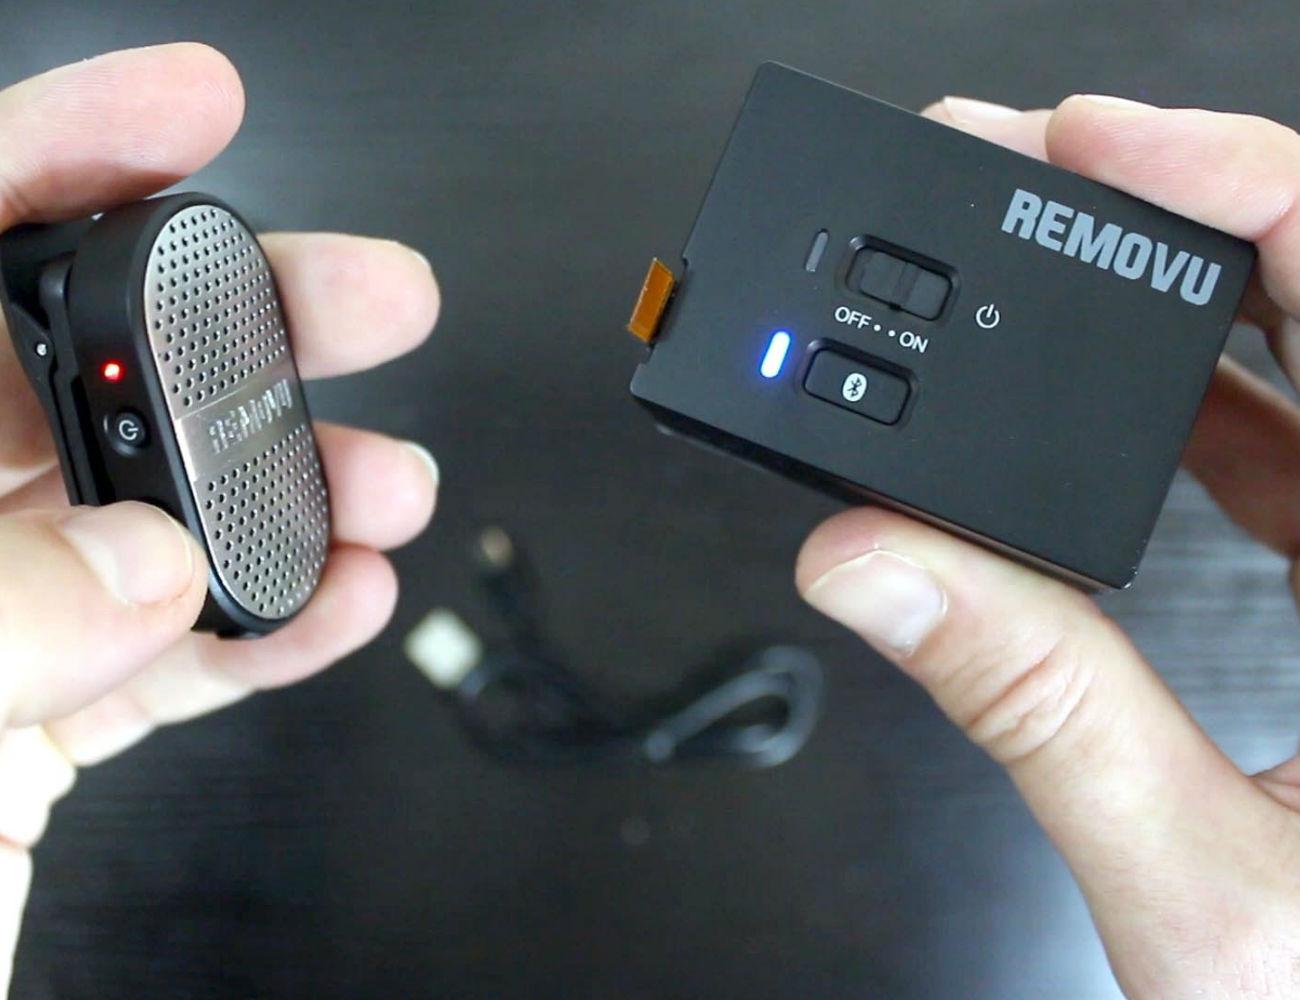 REMOVU Bluetooth Audio Receiver and Waterproof Microphone